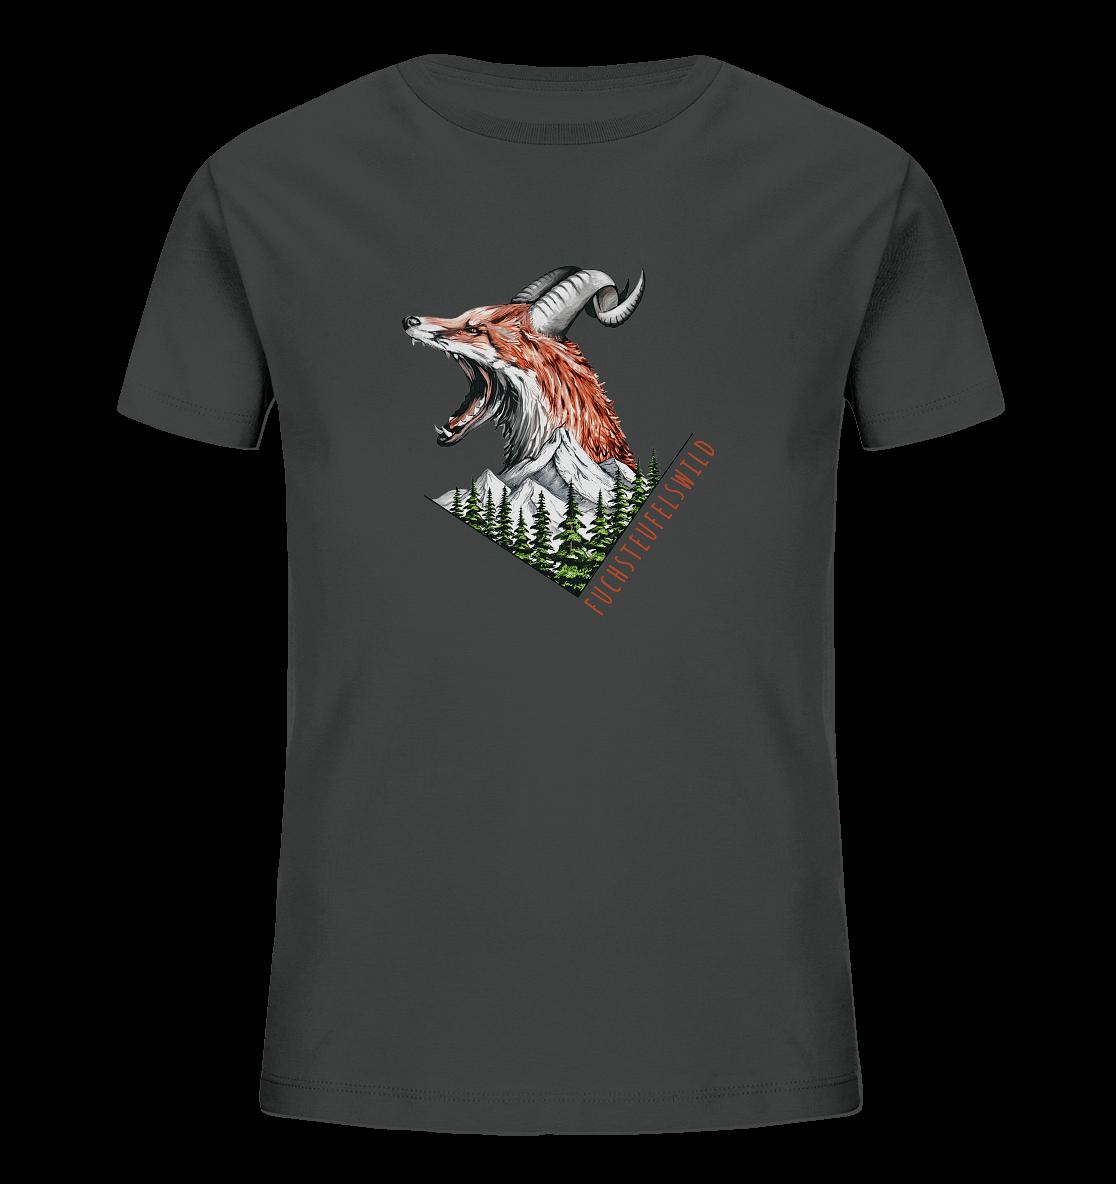 front-kids-organic-shirt-444545-1116x-1.png